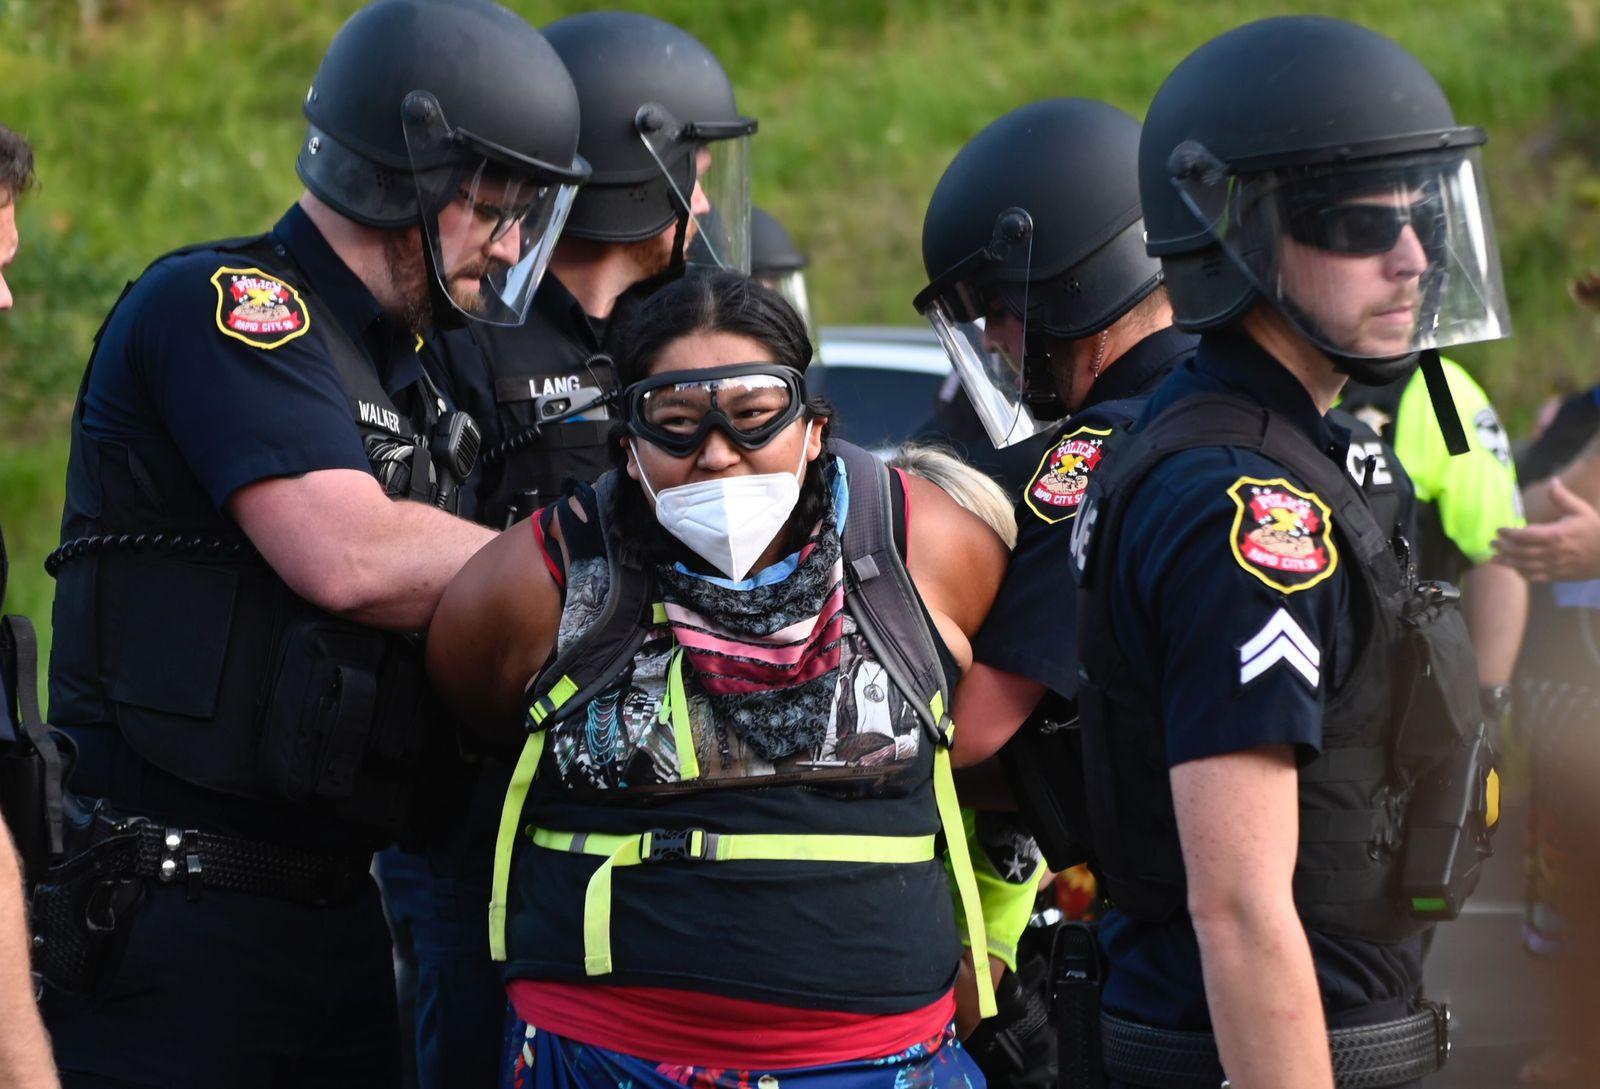 US-HOLIDAY-POLITICS-TRUMP-PROTEST